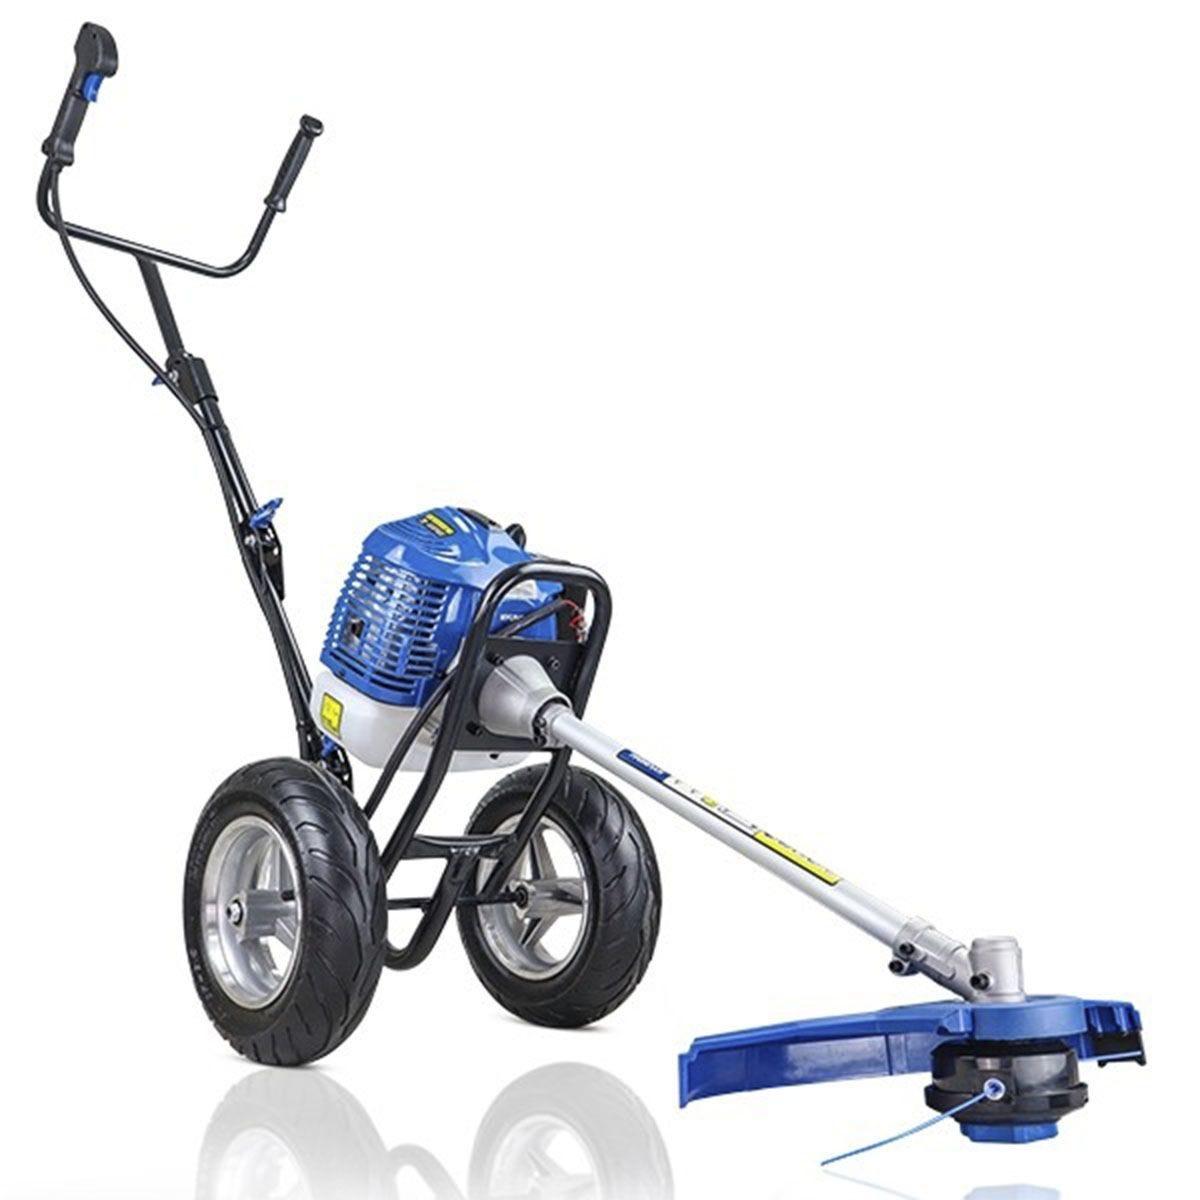 Hyundai HYWT5200X Wheeled Grass Trimmer